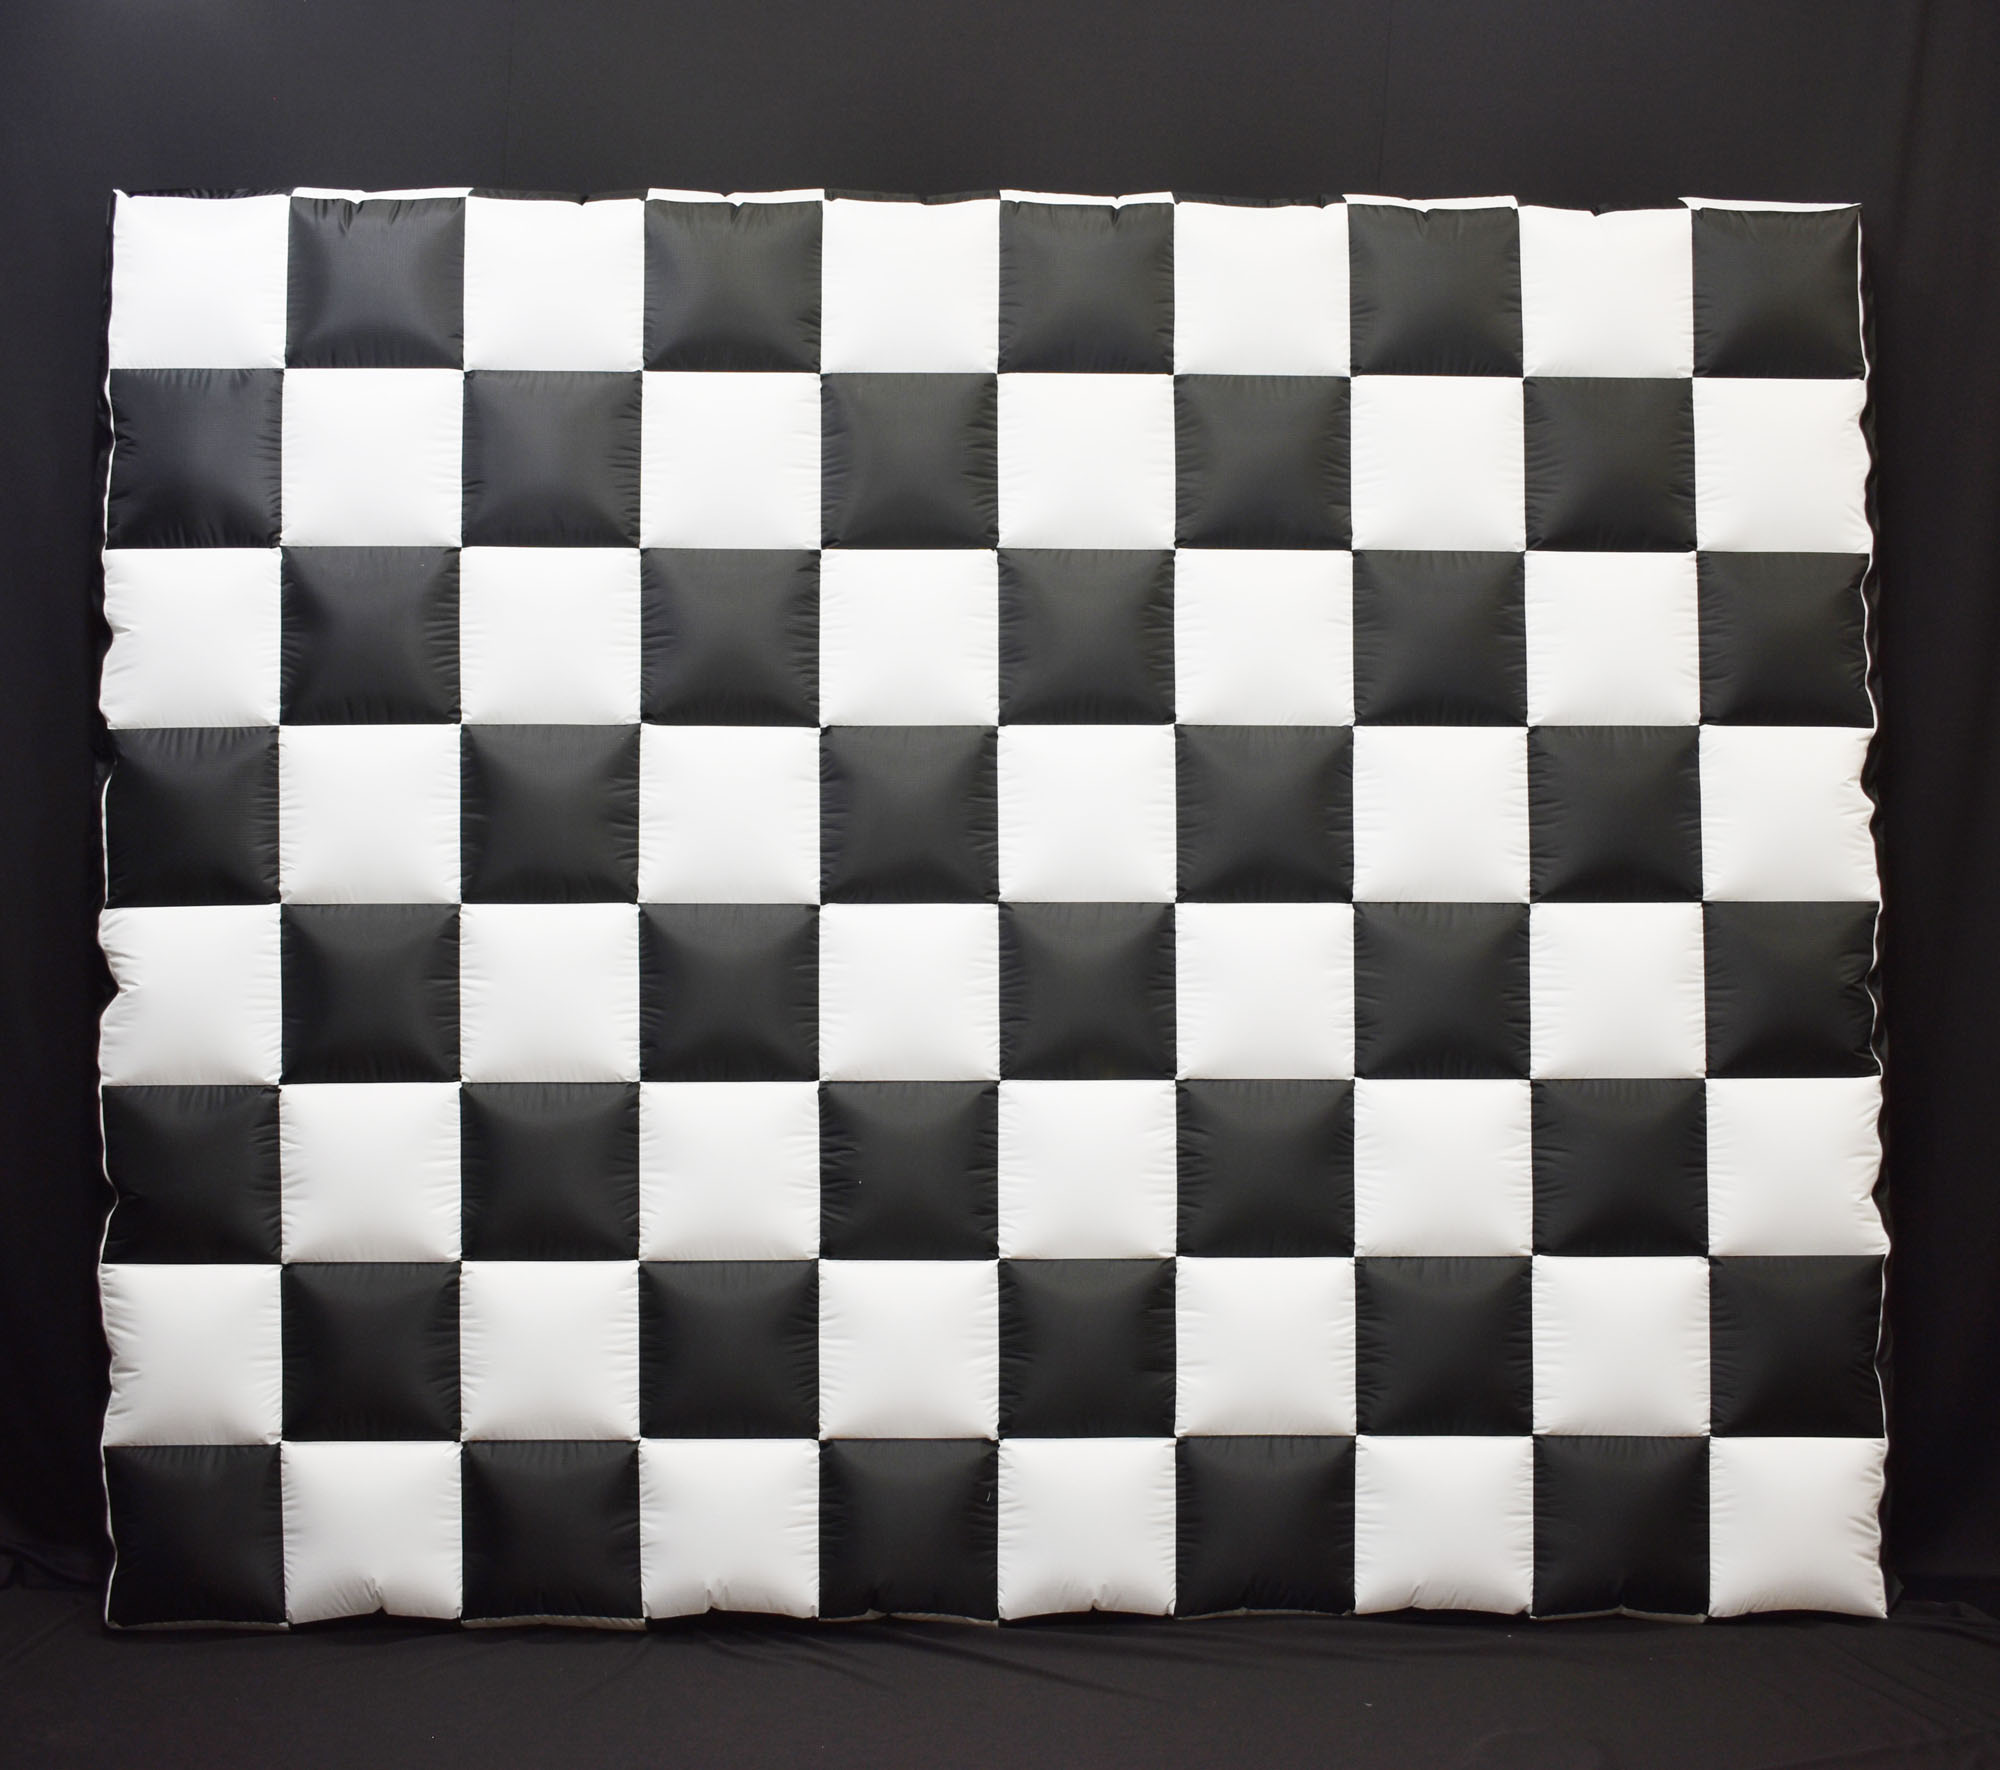 8-x10-BW-Wall--uai-2880x2549.jpg